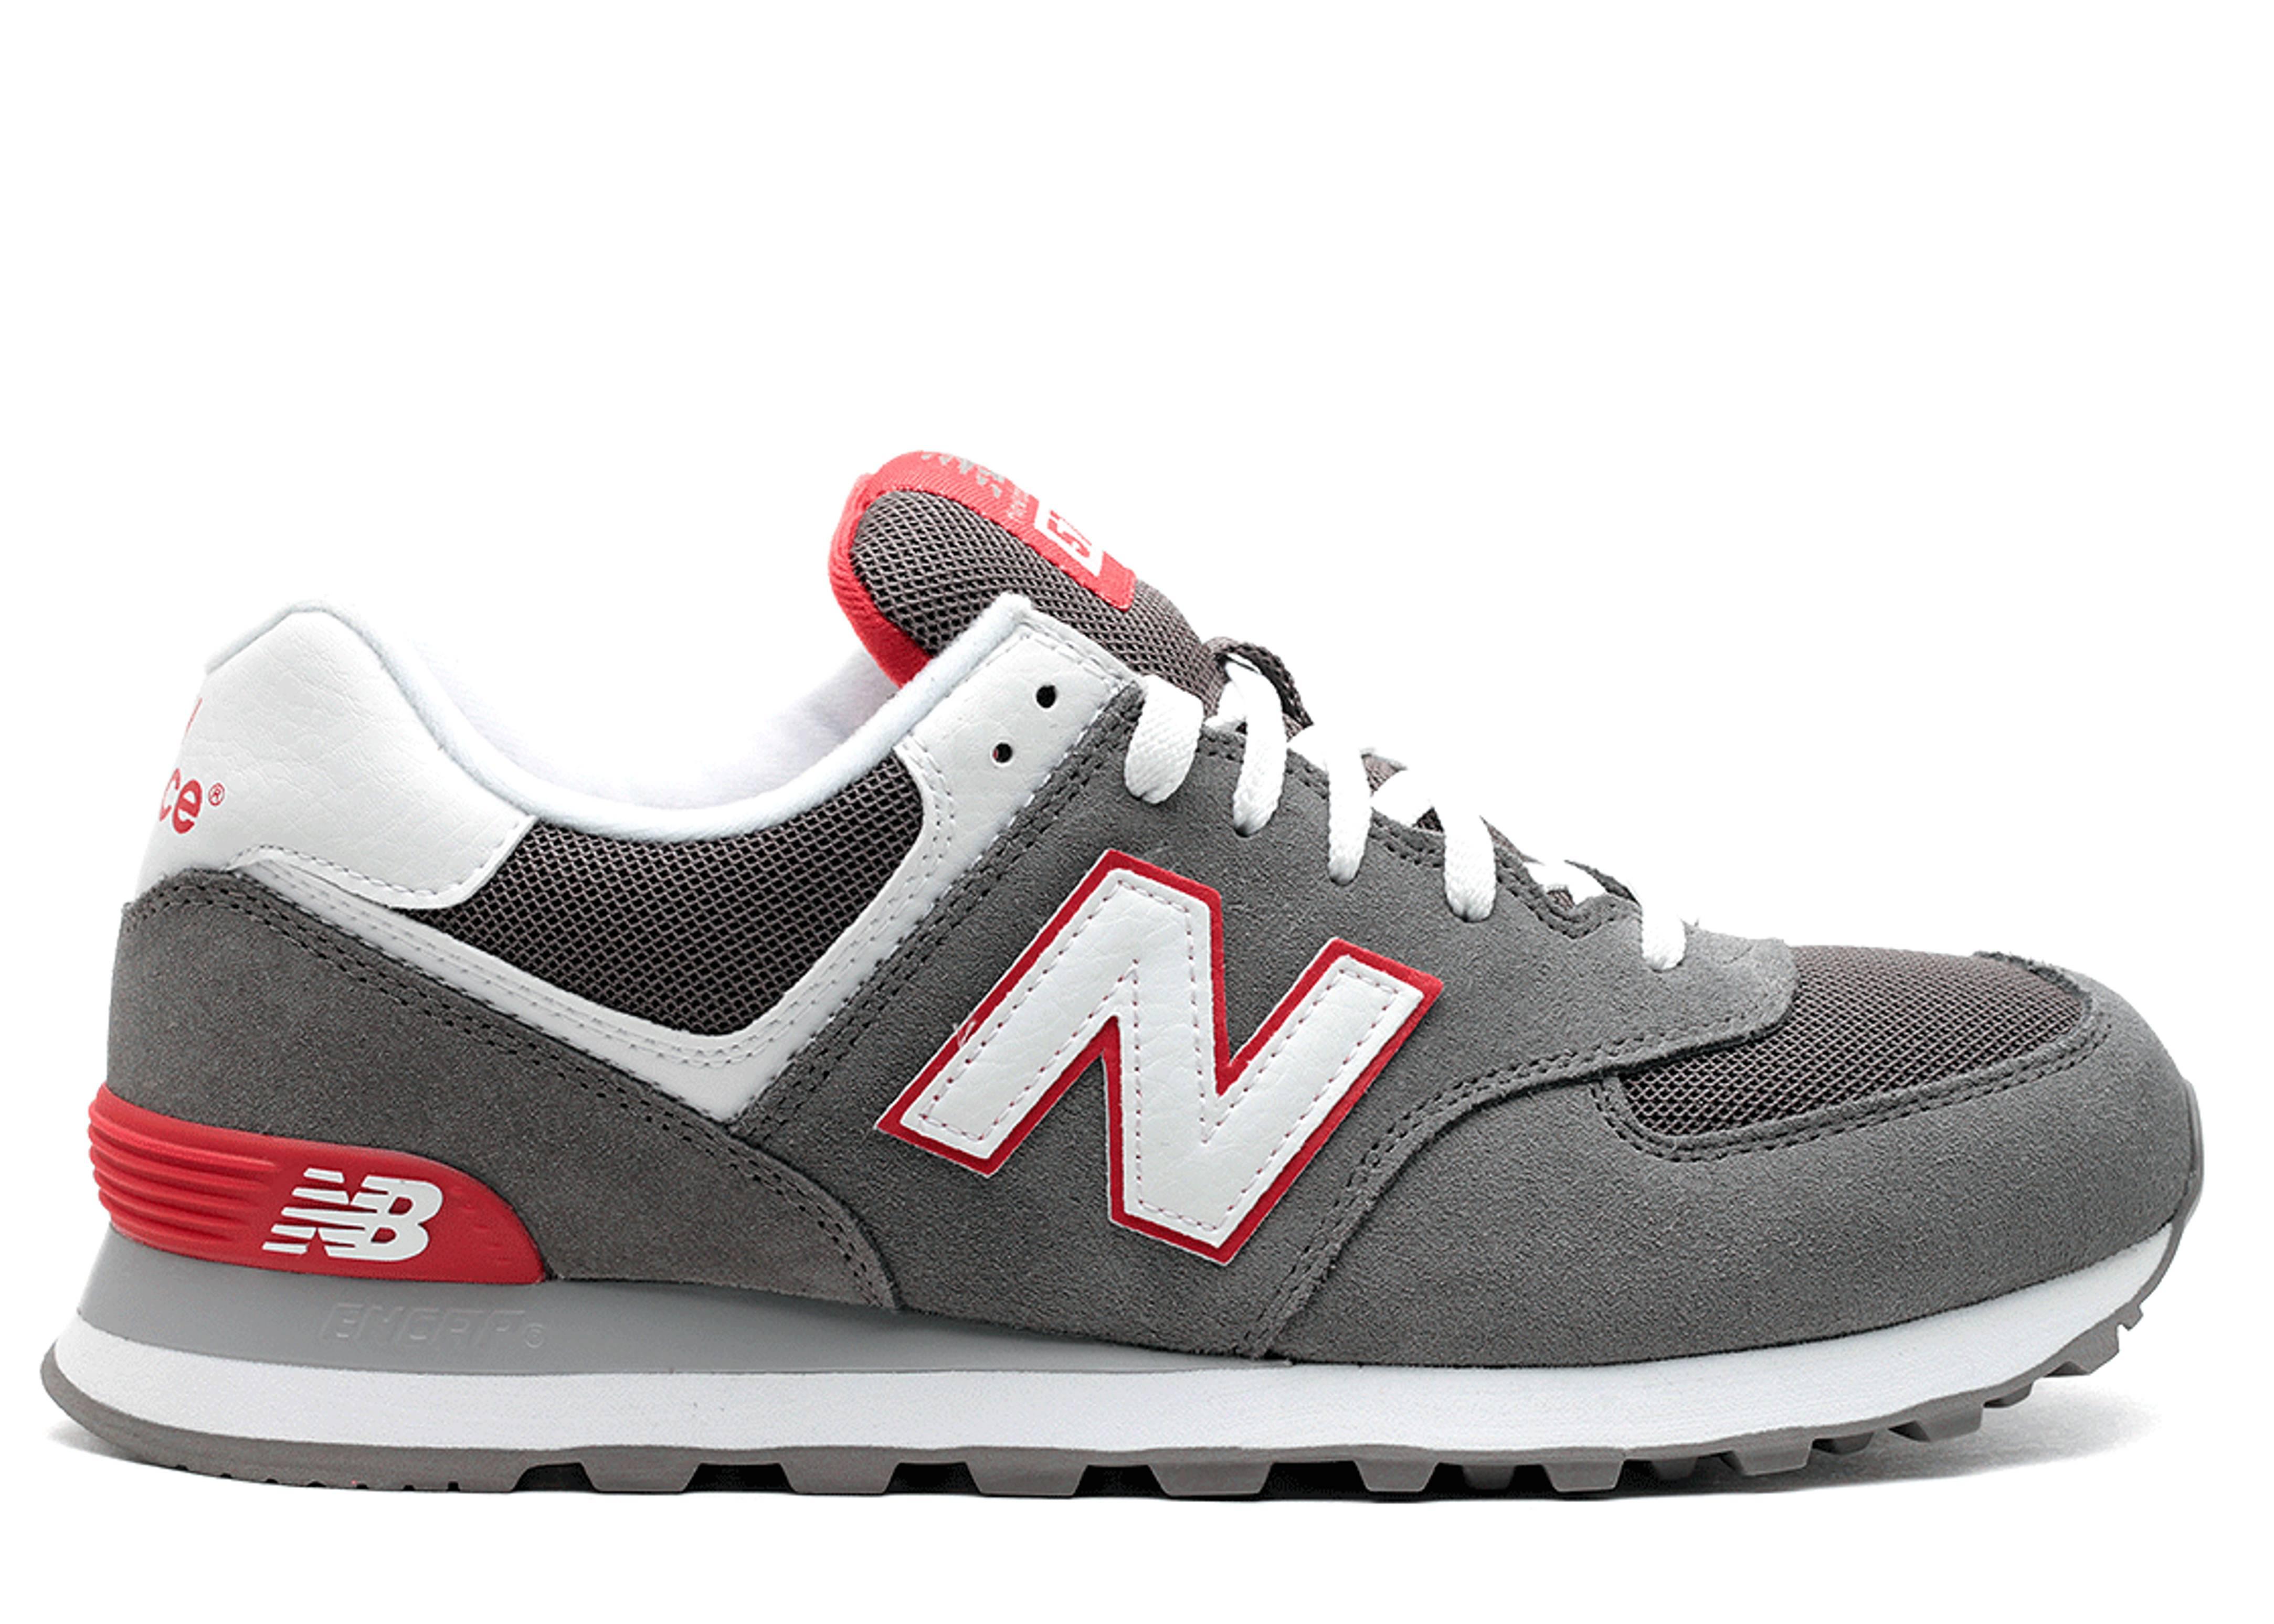 sale retailer e321c a9ebe Ml574 - New Balance - ml574grw - grey/white/red | Flight Club